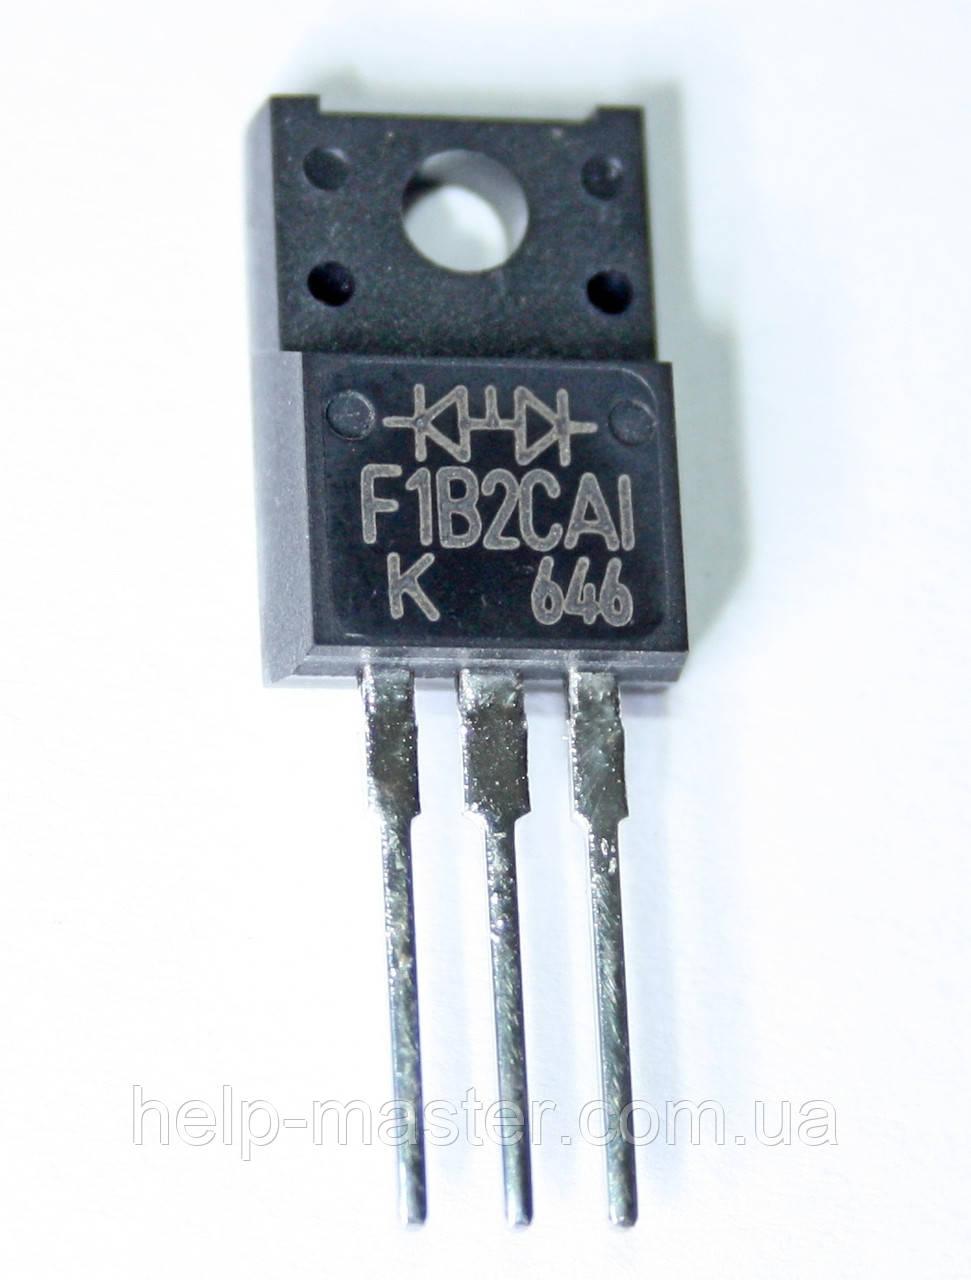 Діод F1B2CAI (TO-220)